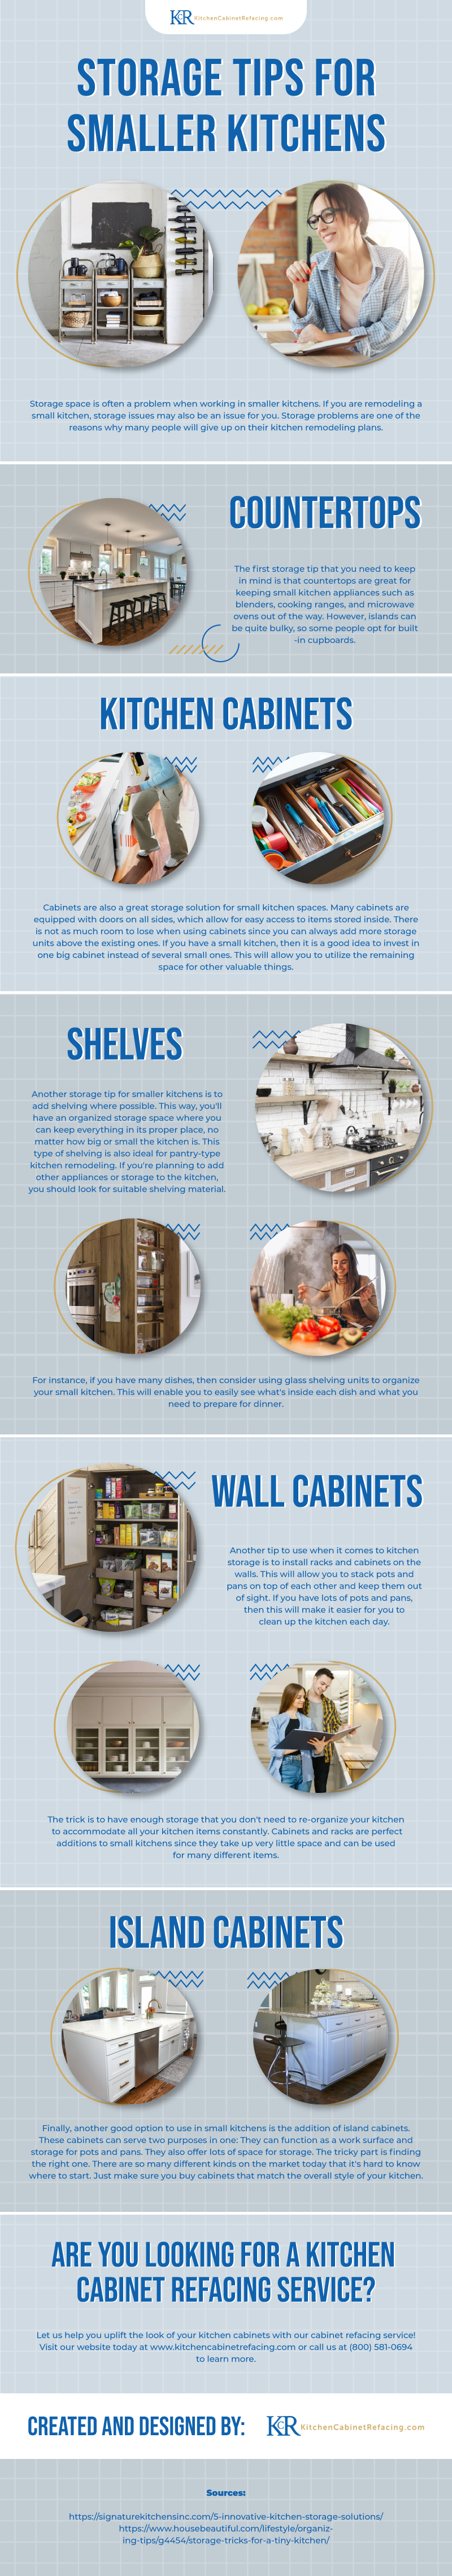 Storage Tips for Smaller Kitchens